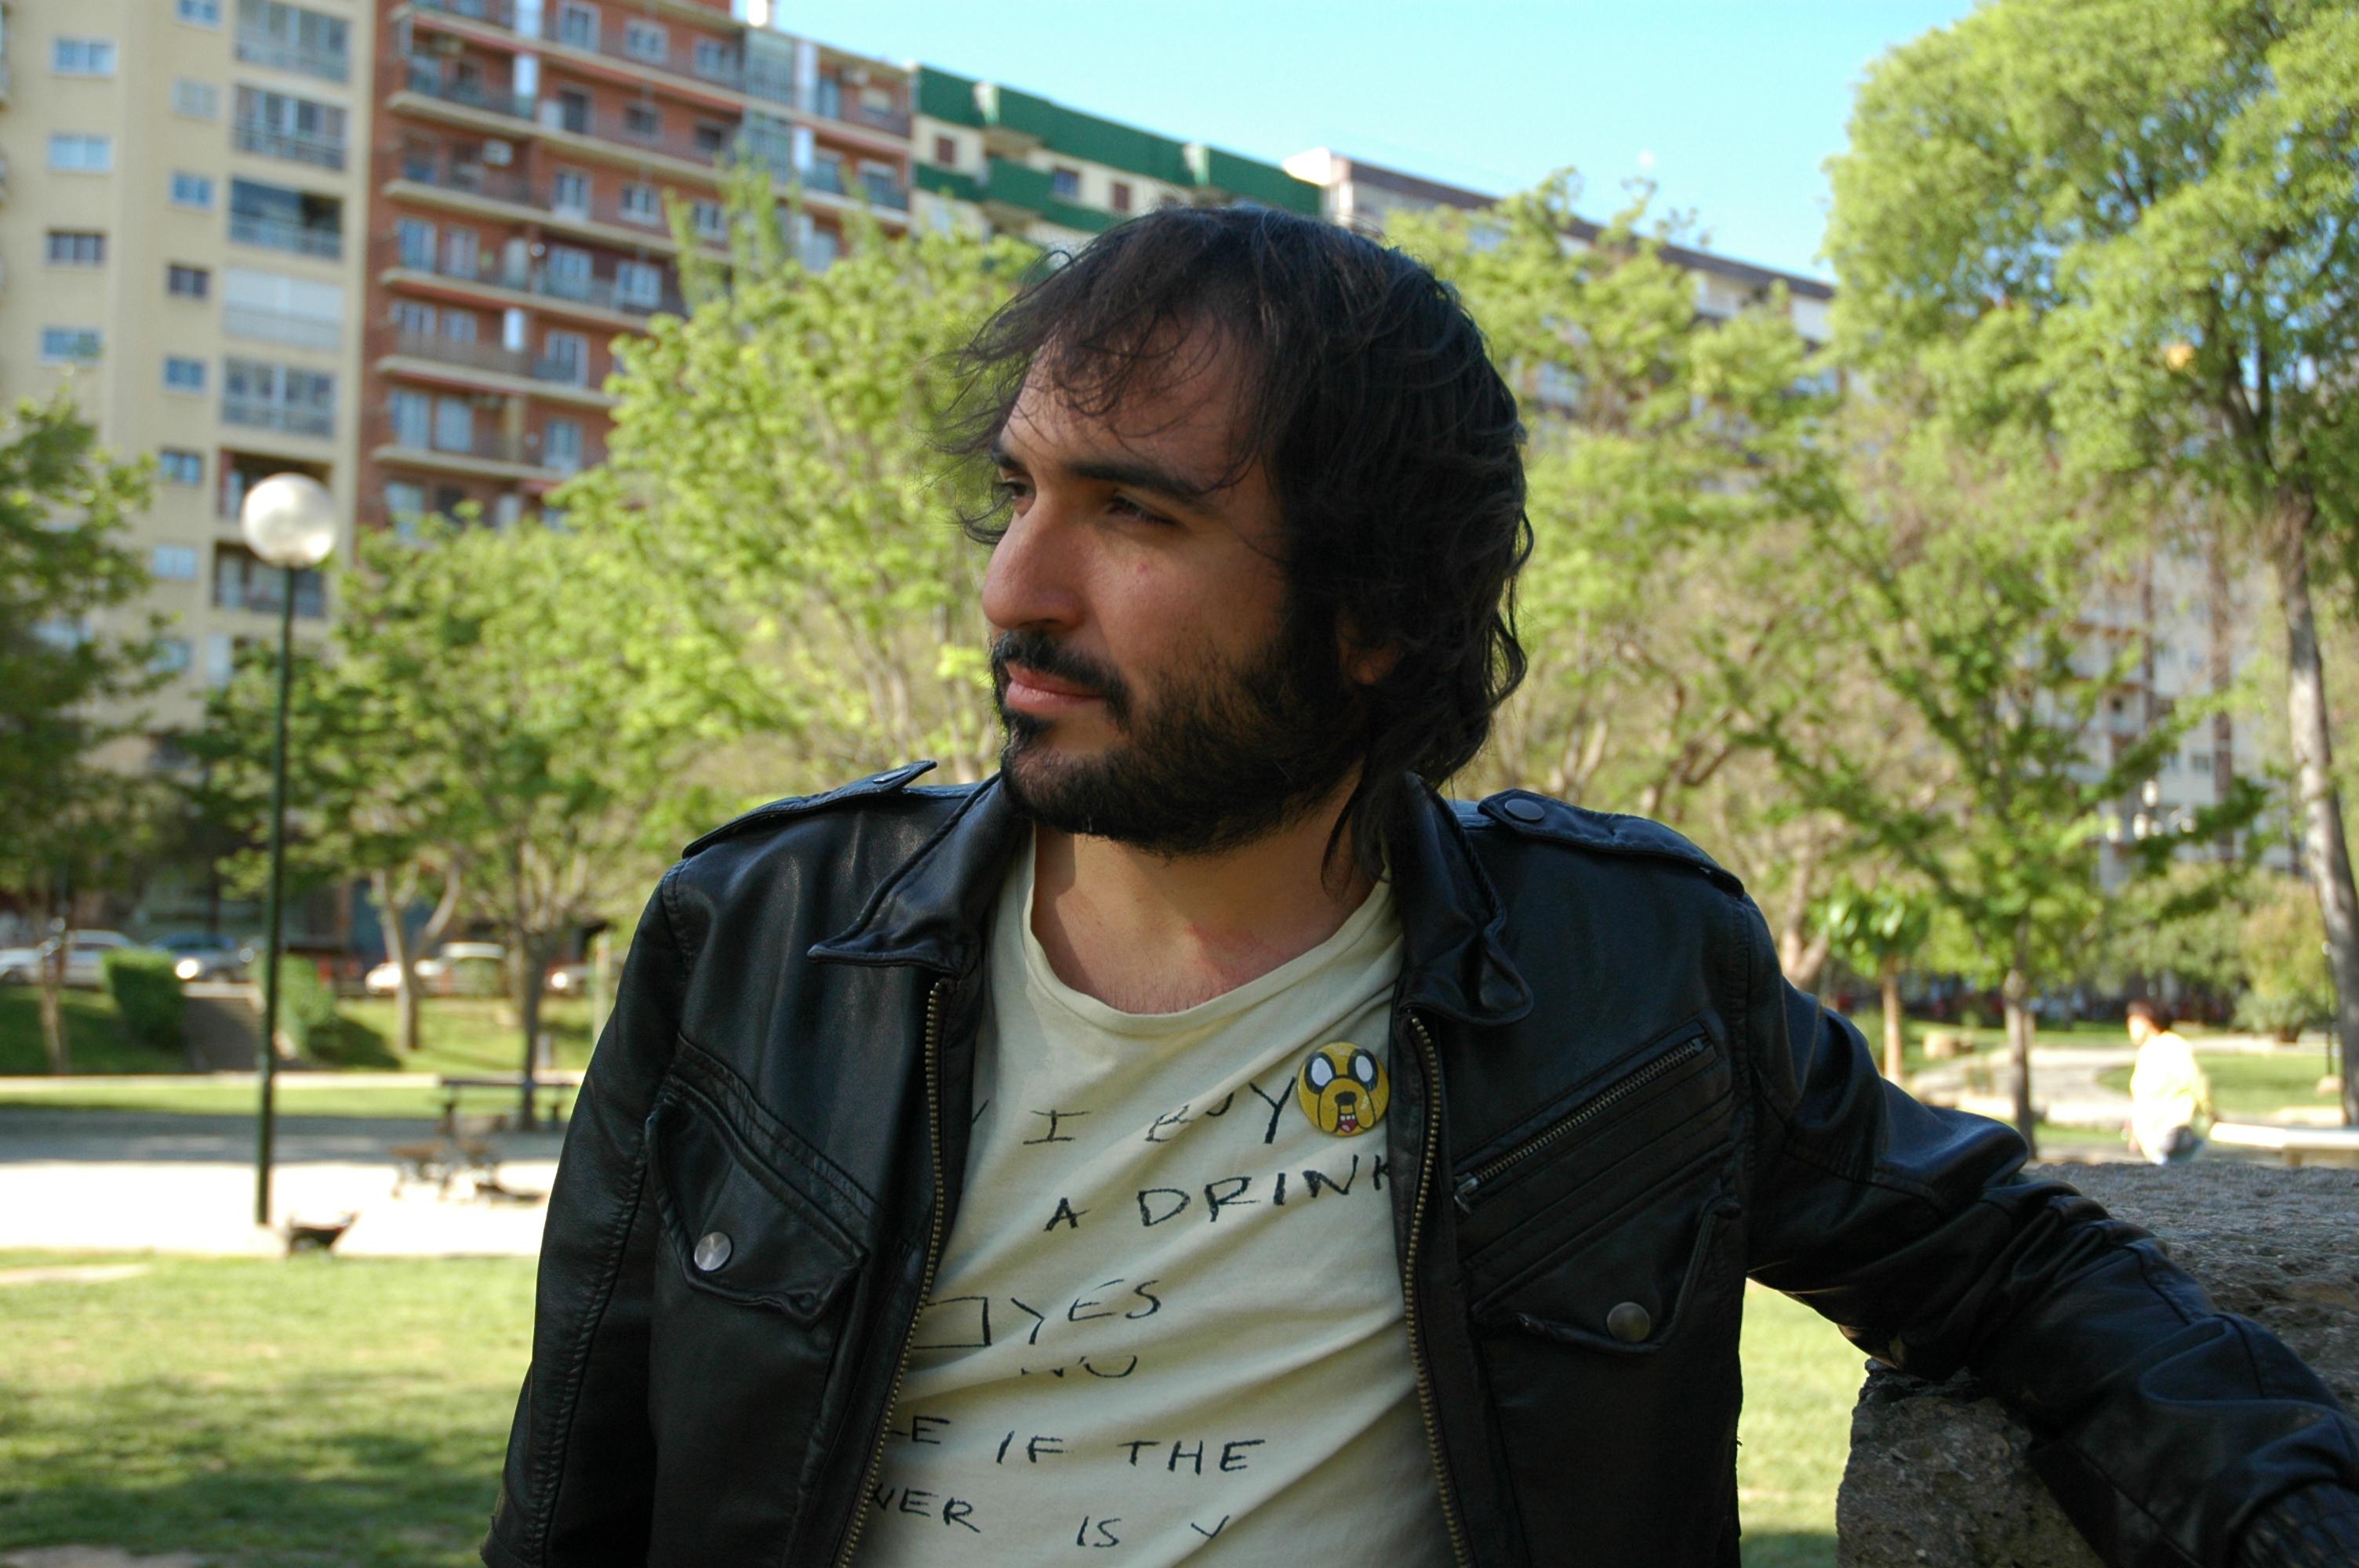 Book_1_David_Pallás_Gozalo_Parque_54